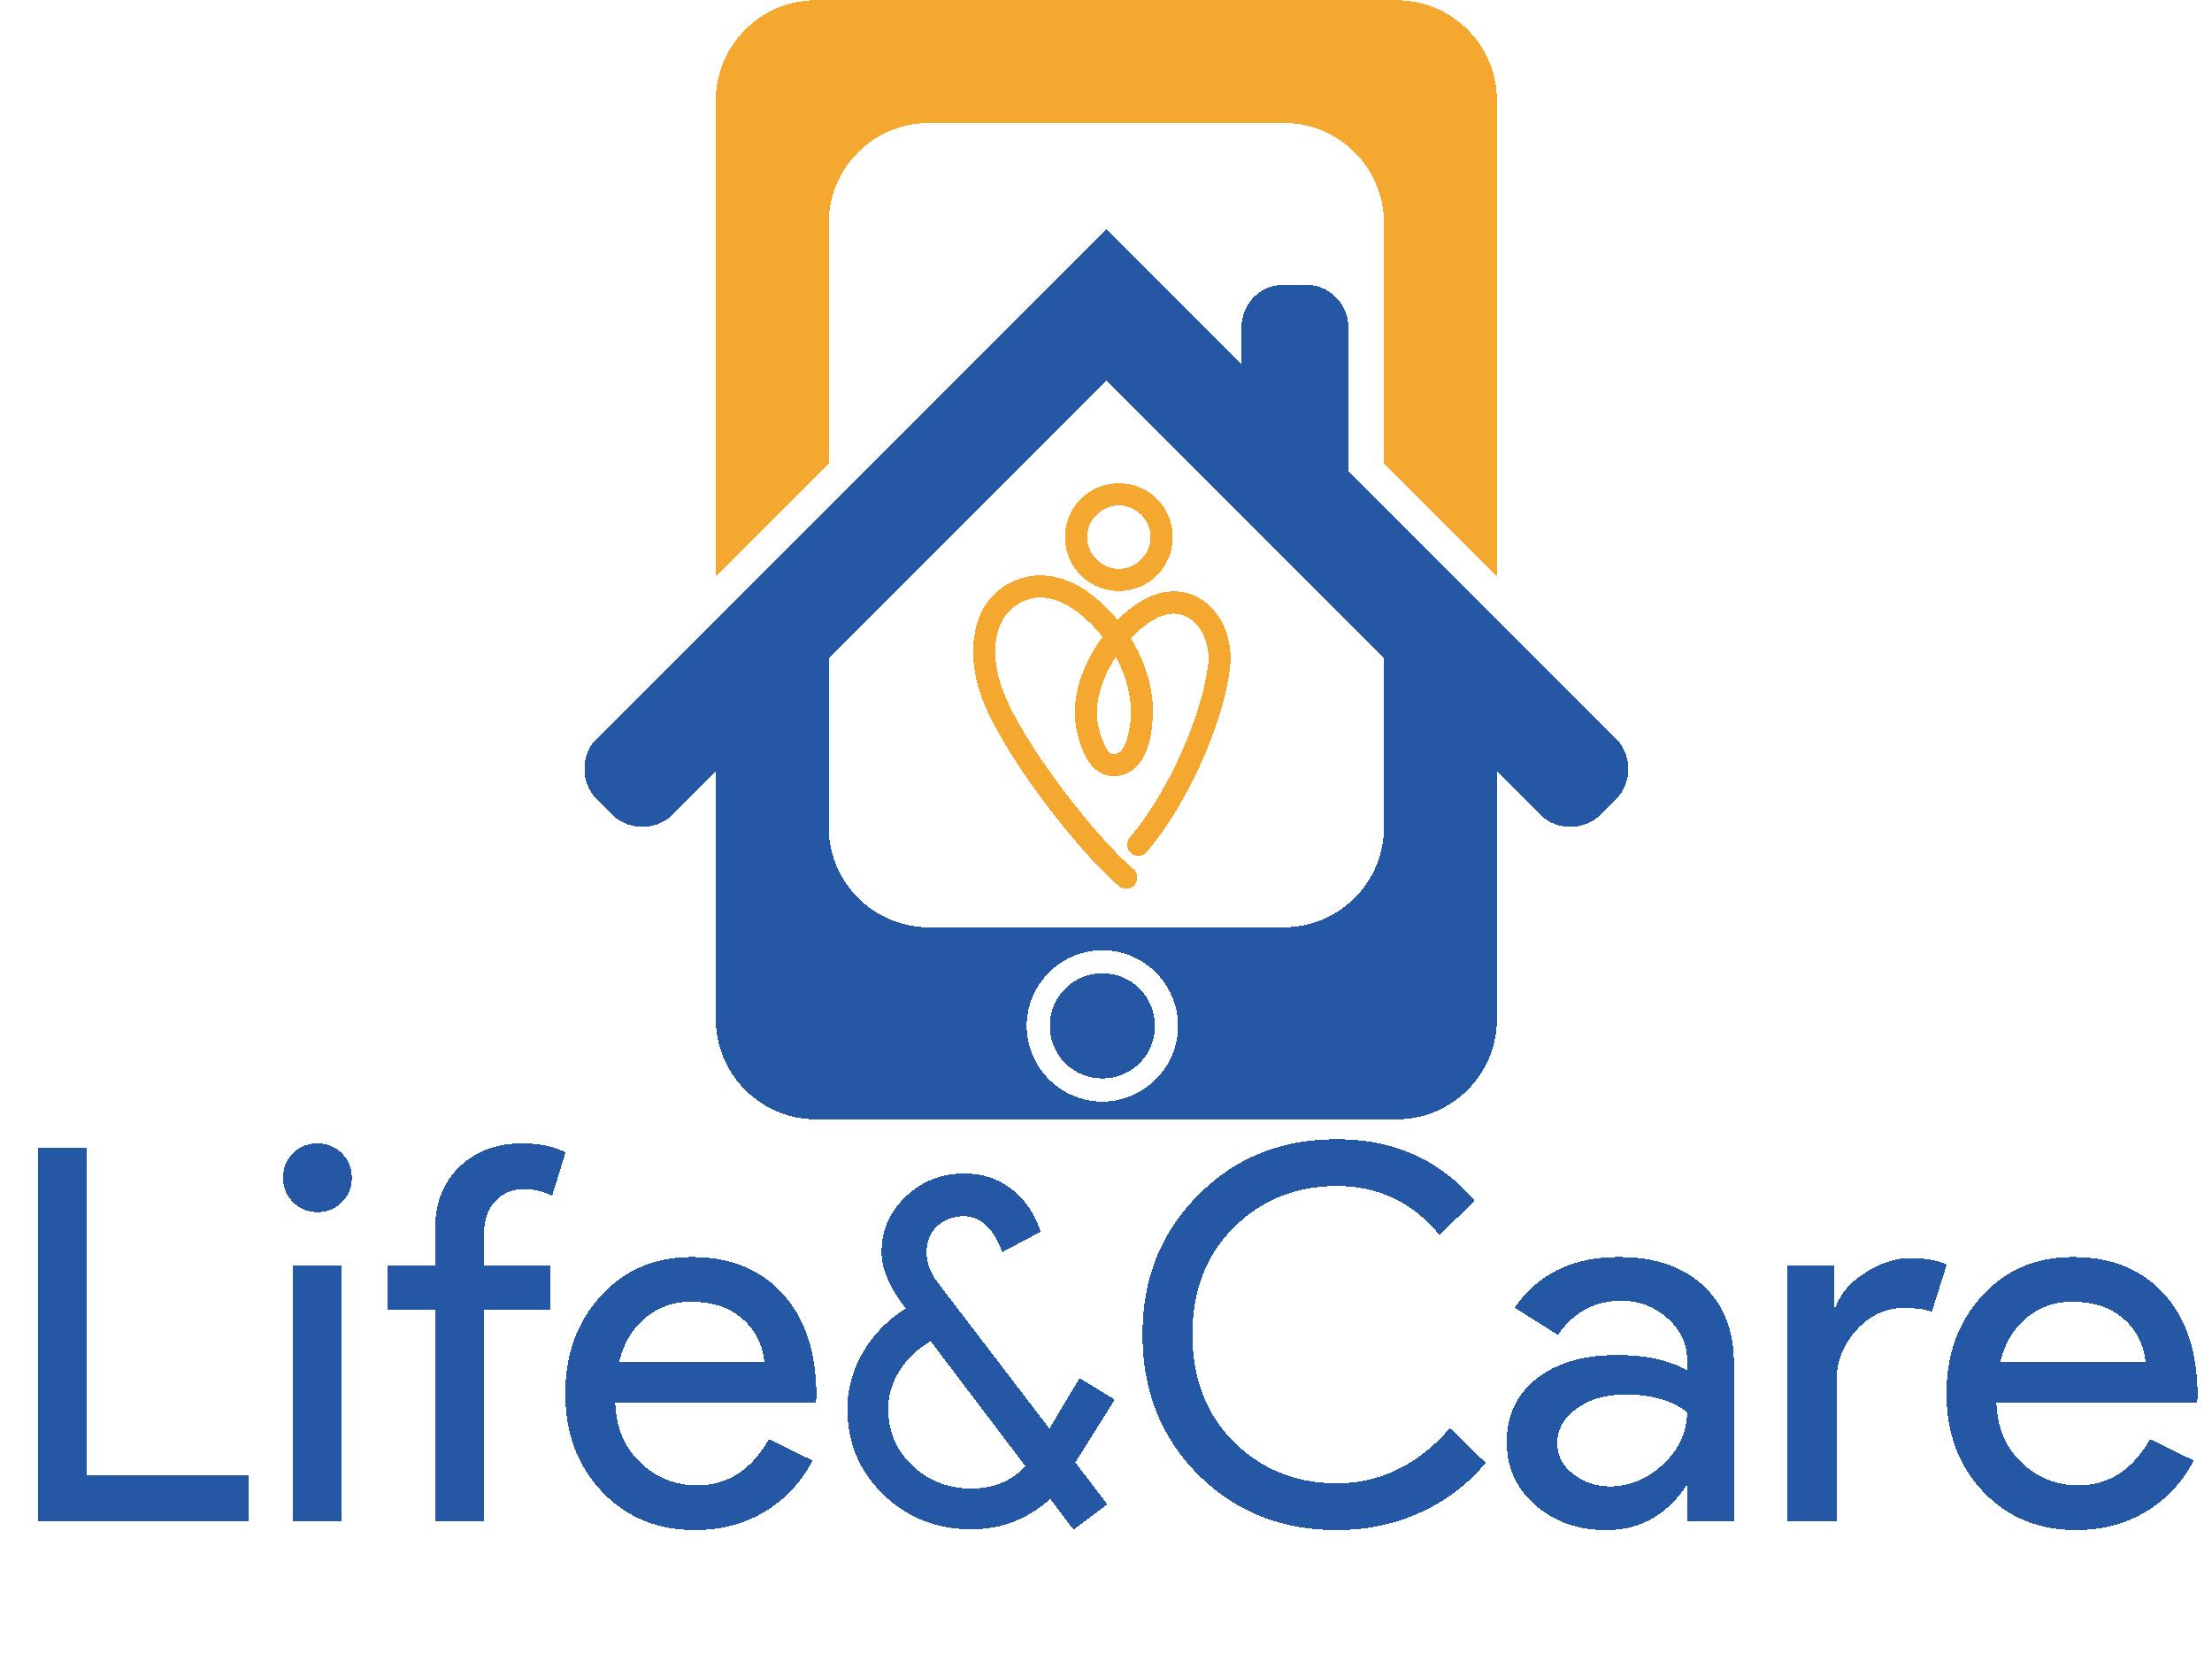 Life&Care